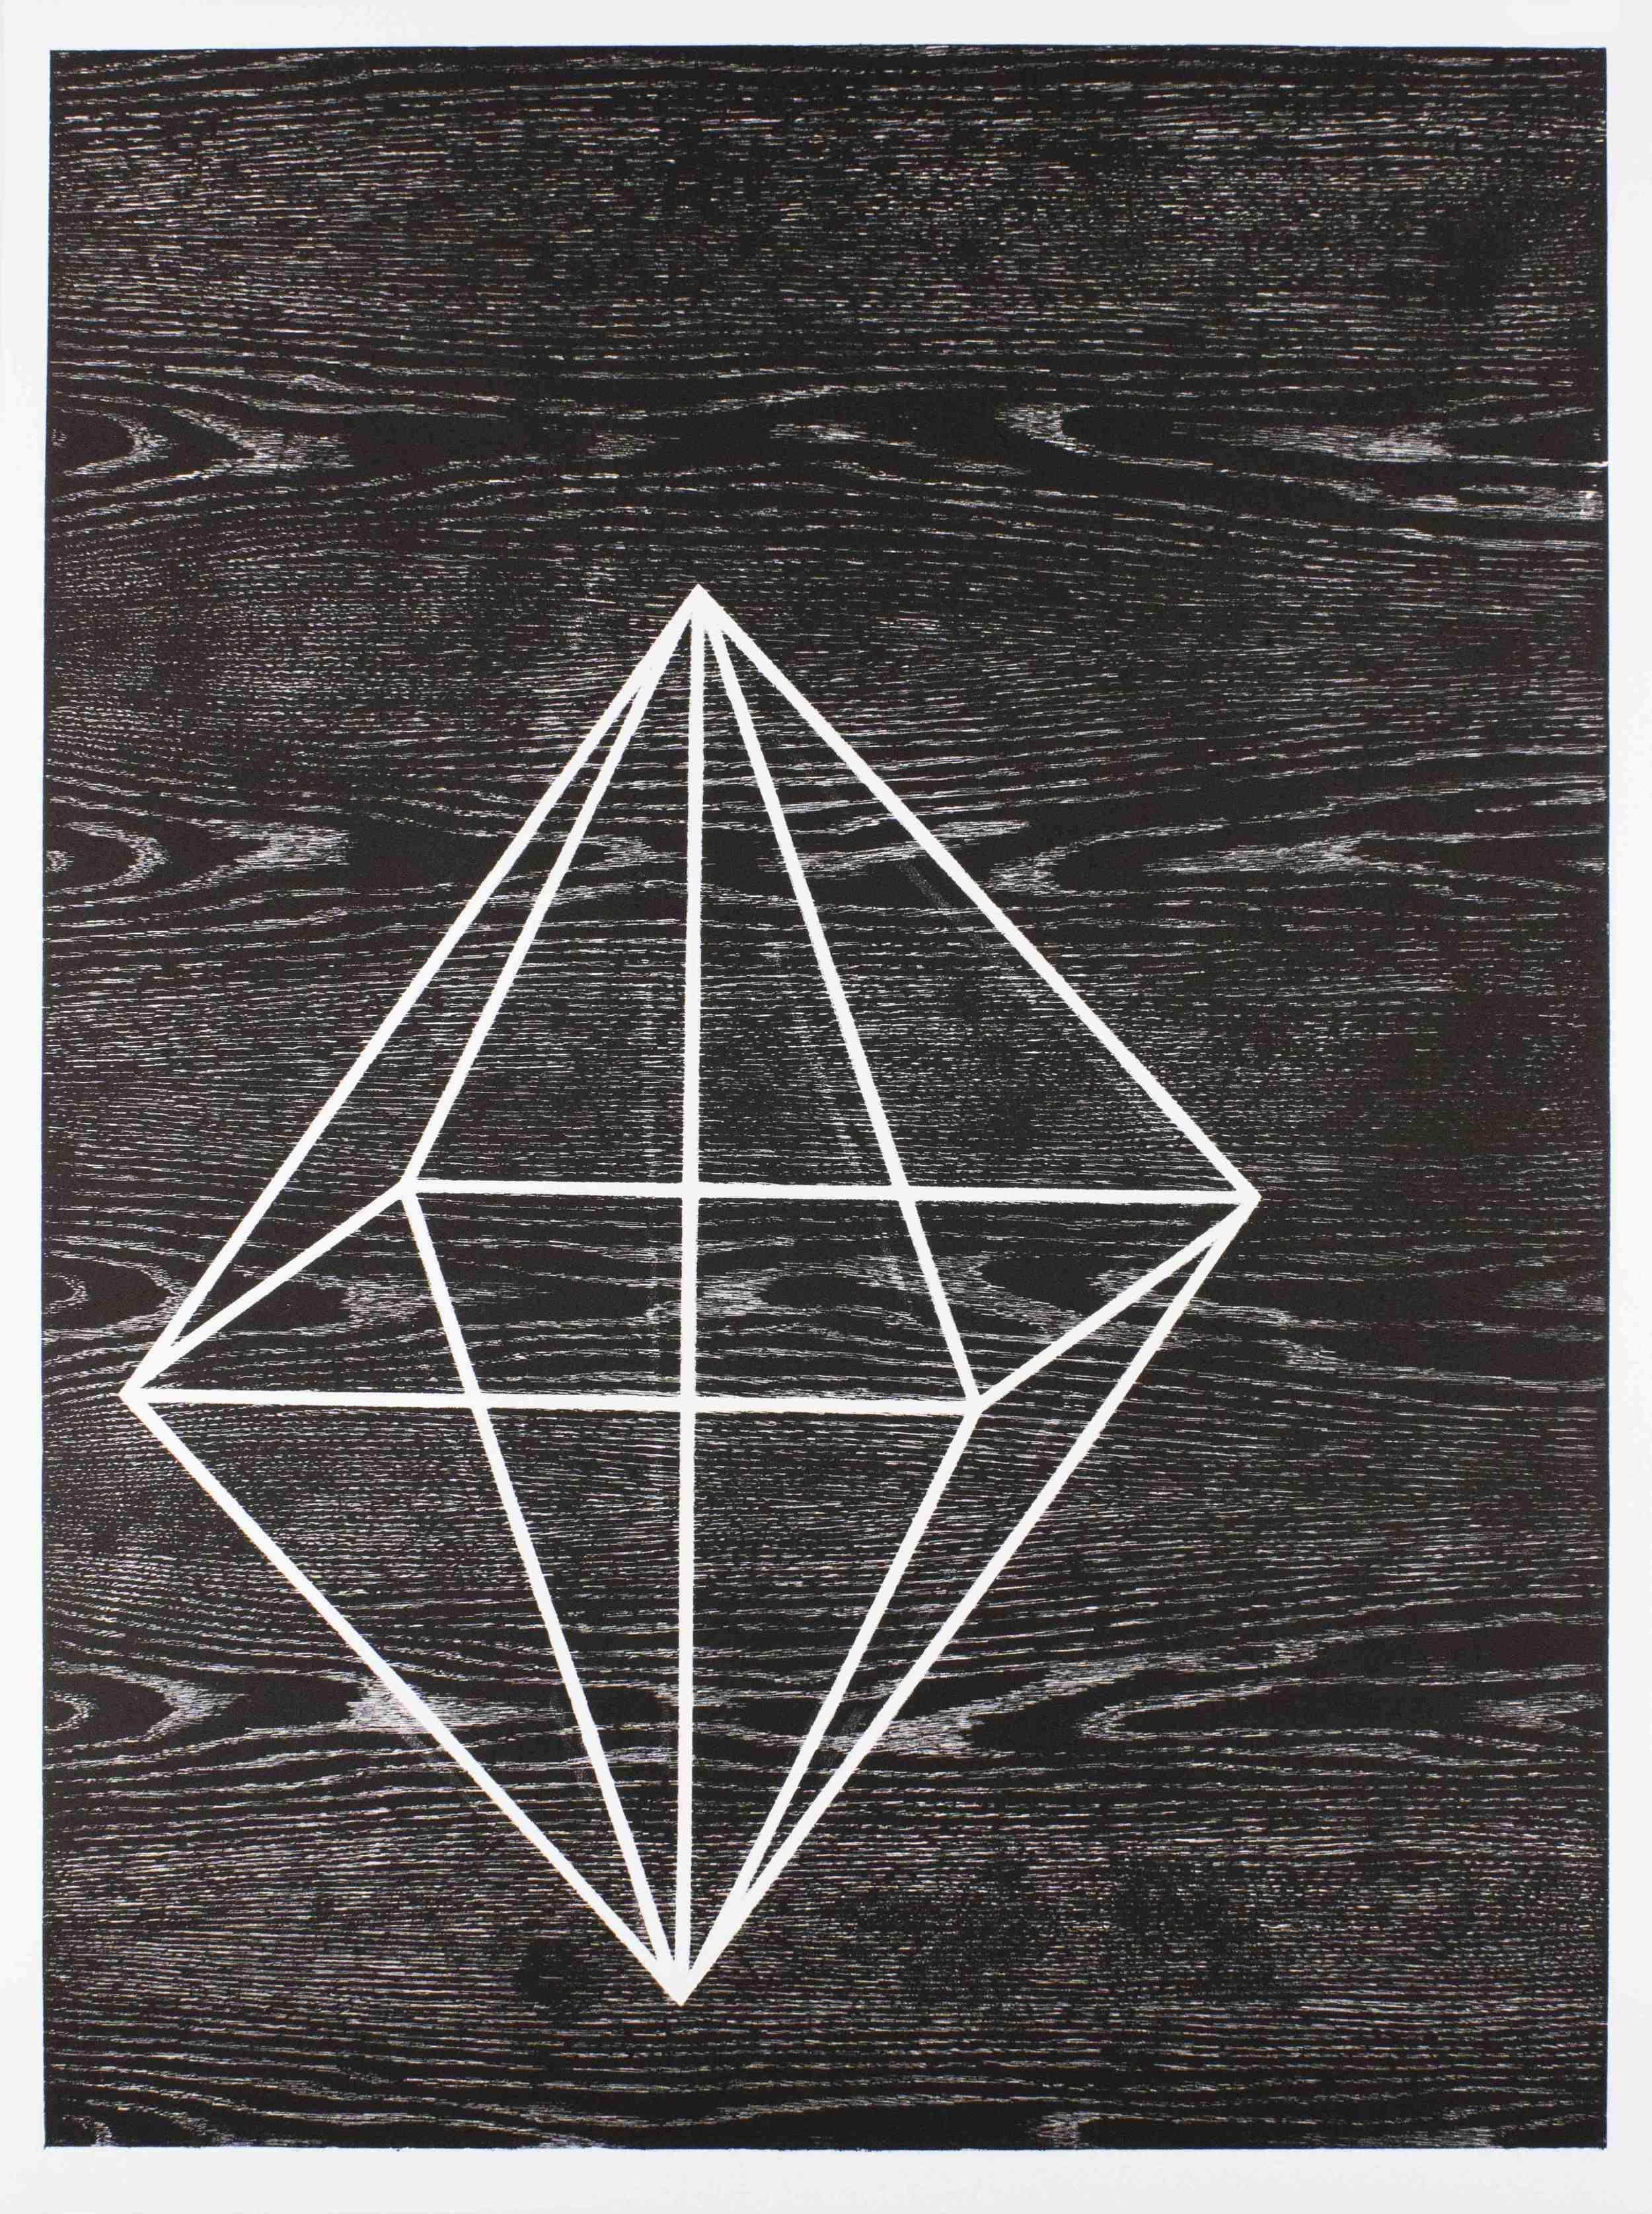 7Pyramid, Reflection edit.jpeg